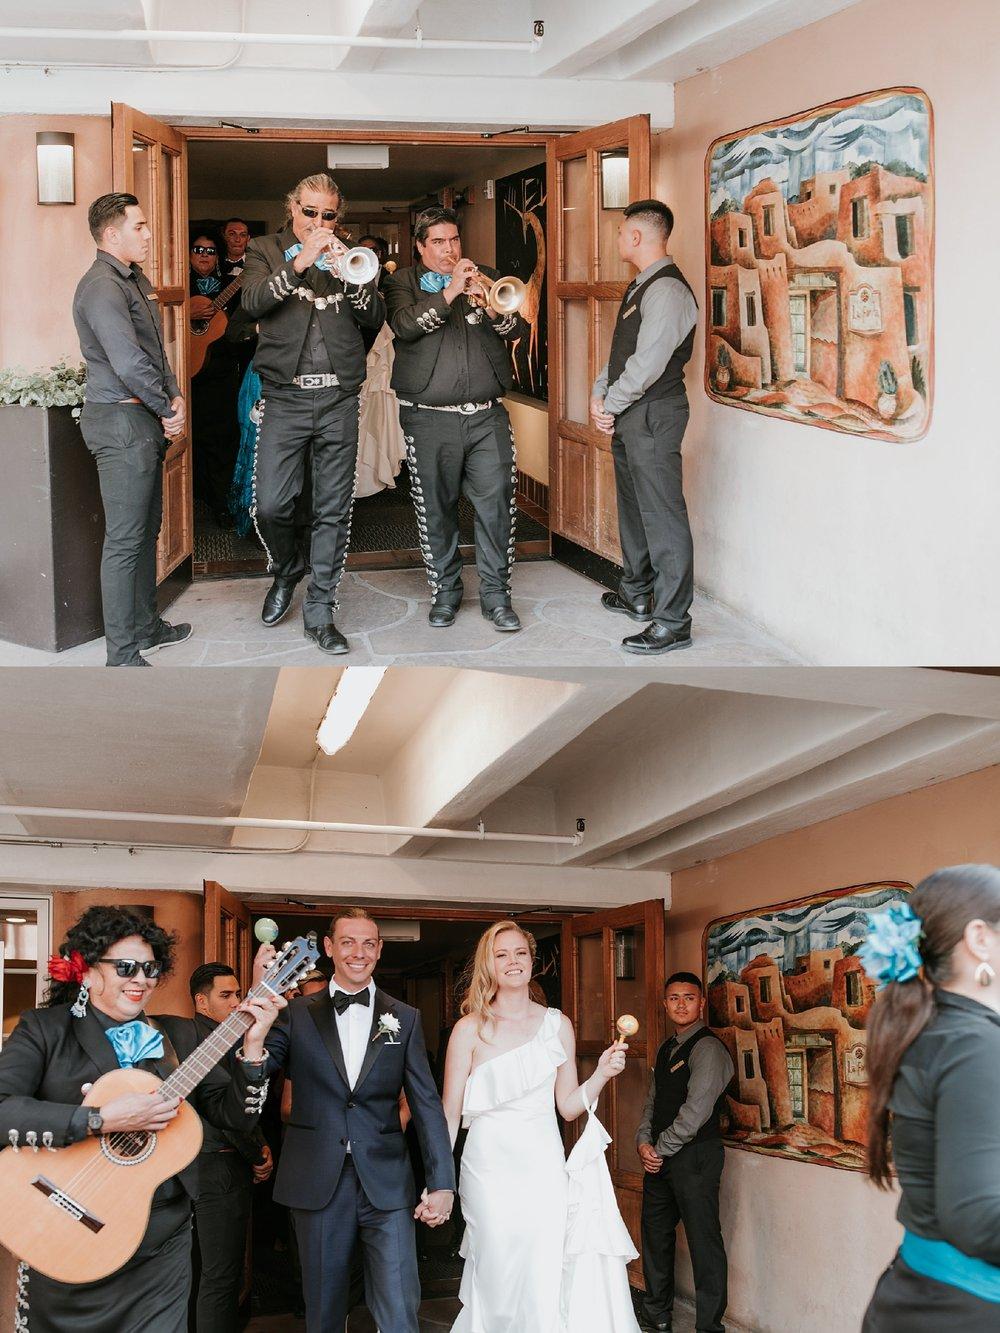 Alicia+lucia+photography+-+albuquerque+wedding+photographer+-+santa+fe+wedding+photography+-+new+mexico+wedding+photographer+-+new+mexico+wedding+-+engagement+-+santa+fe+wedding+-+la+fonda+on+the+plaza+-+la+fonda+wedding_0074.jpg